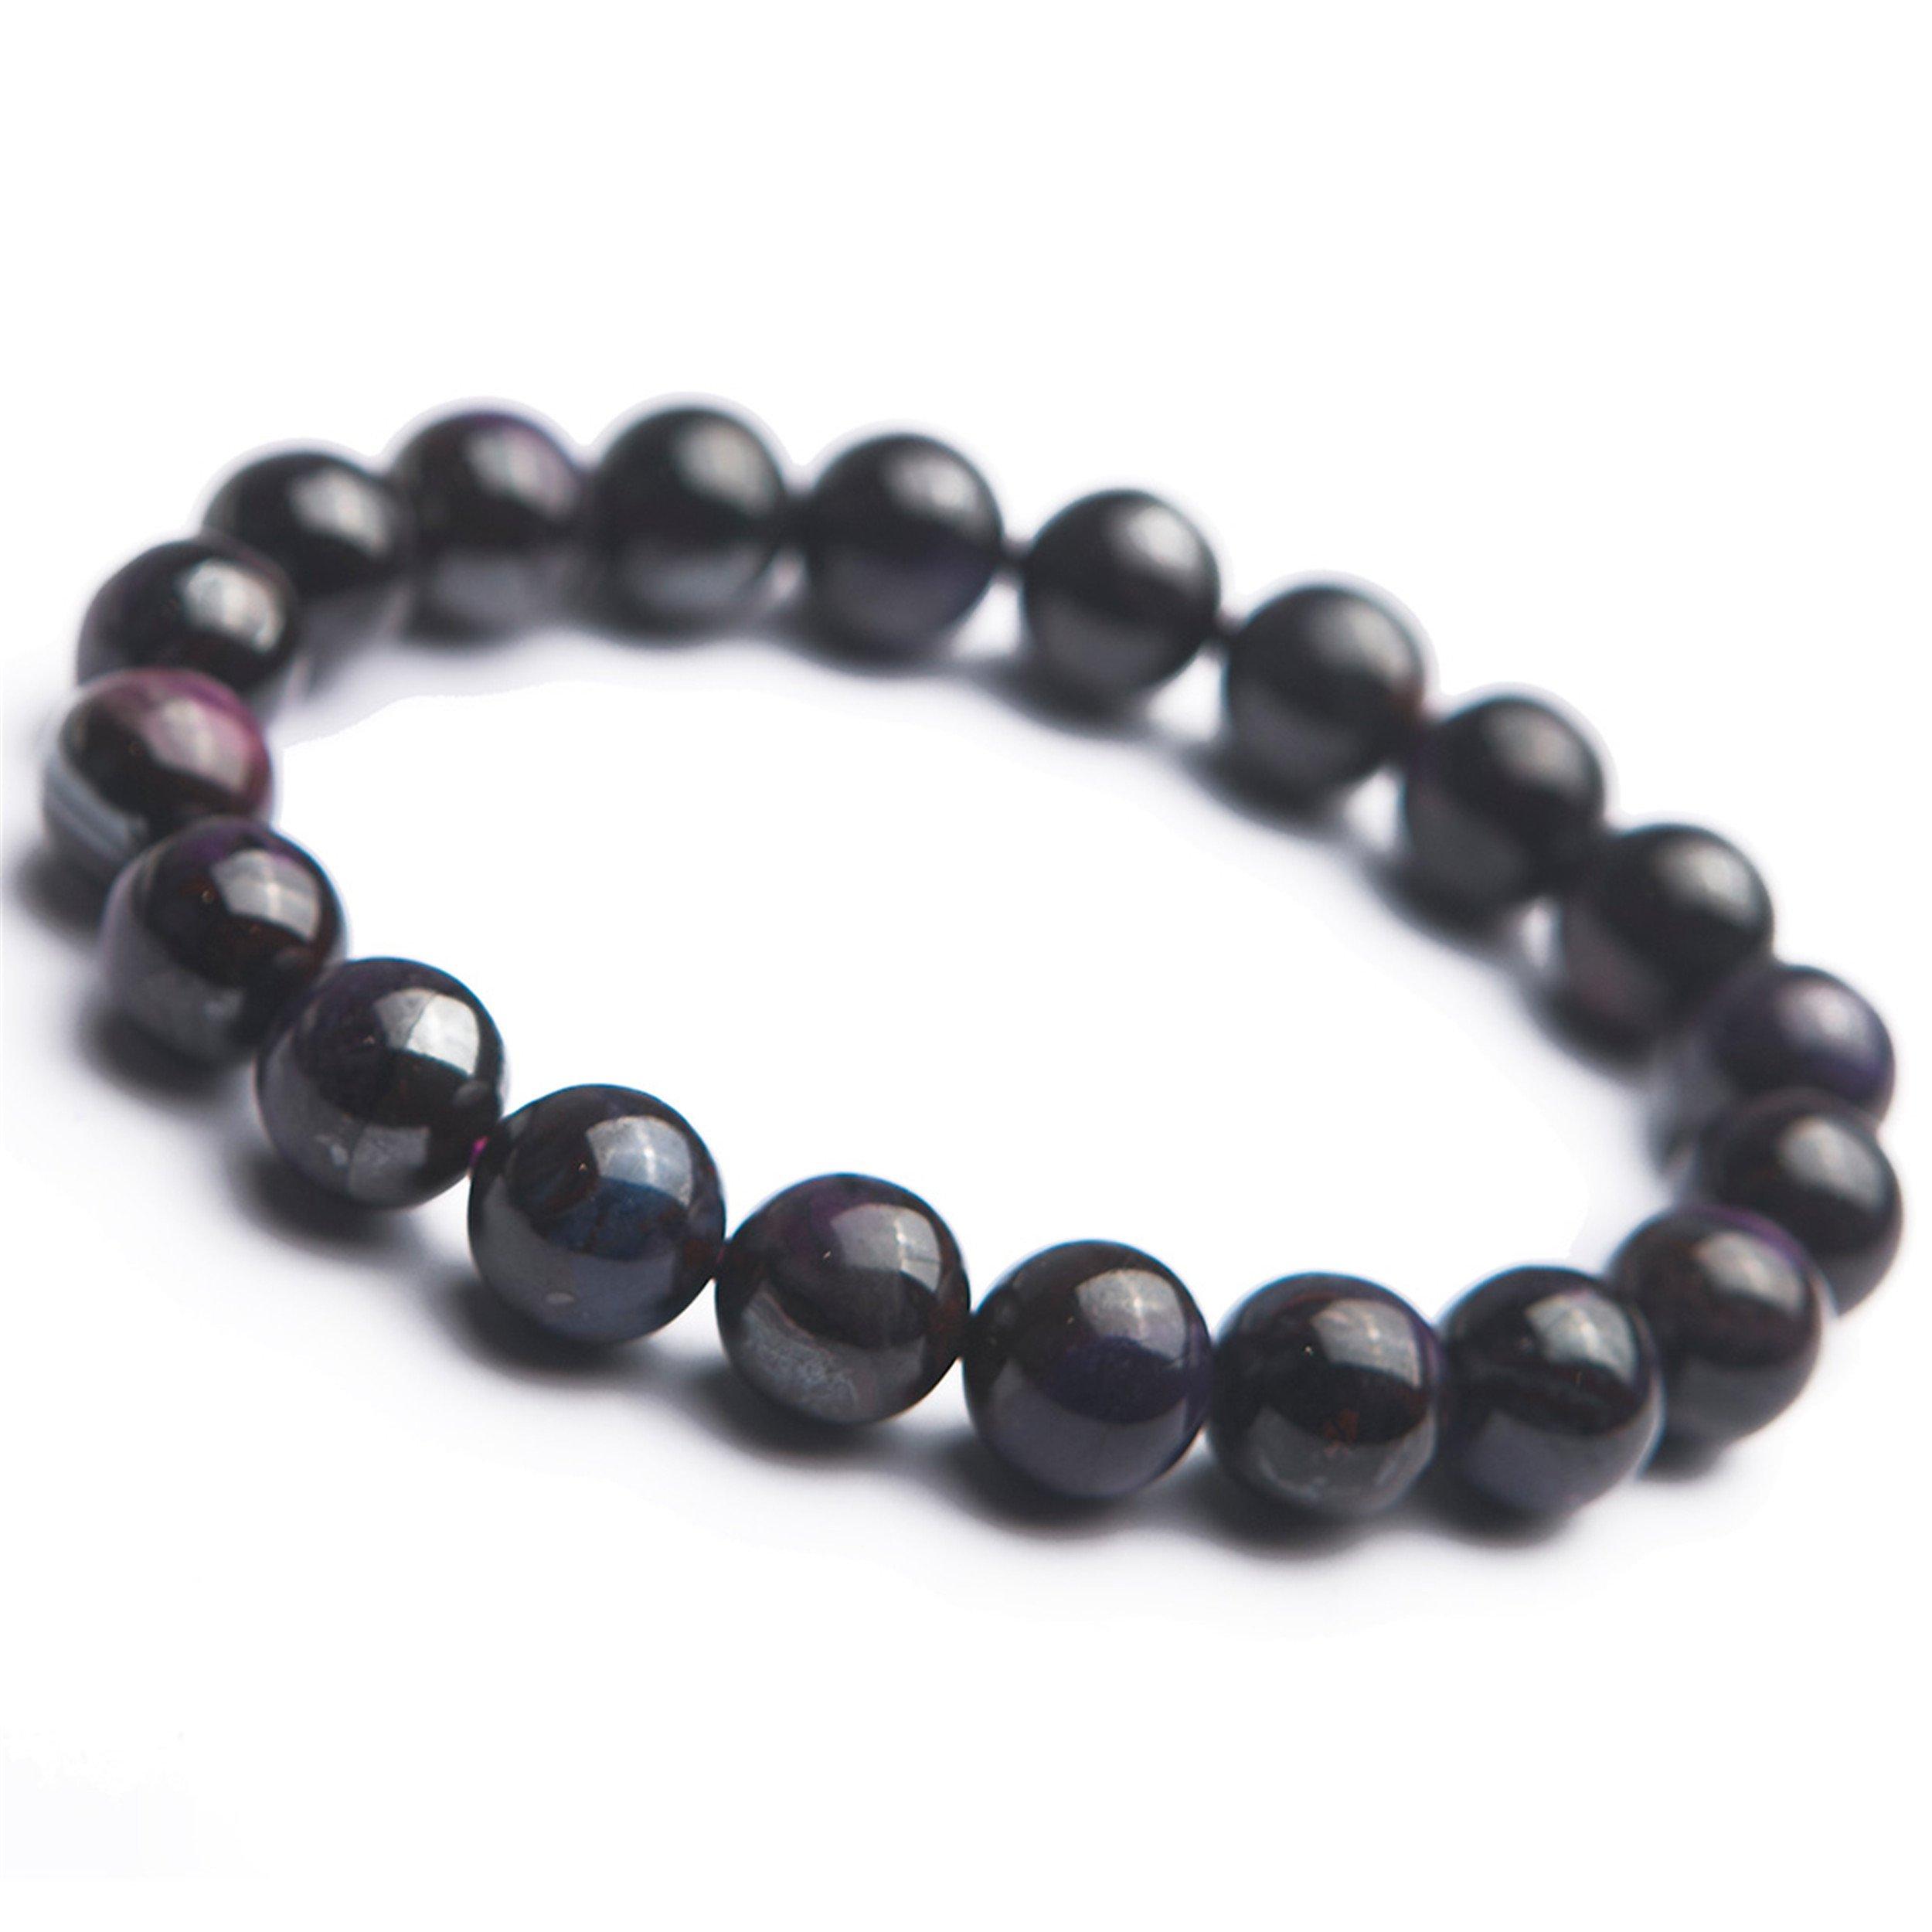 10mm Purple Sugilite Gemstone Crystal Round Bead Stretch Natural Stone Bracelet